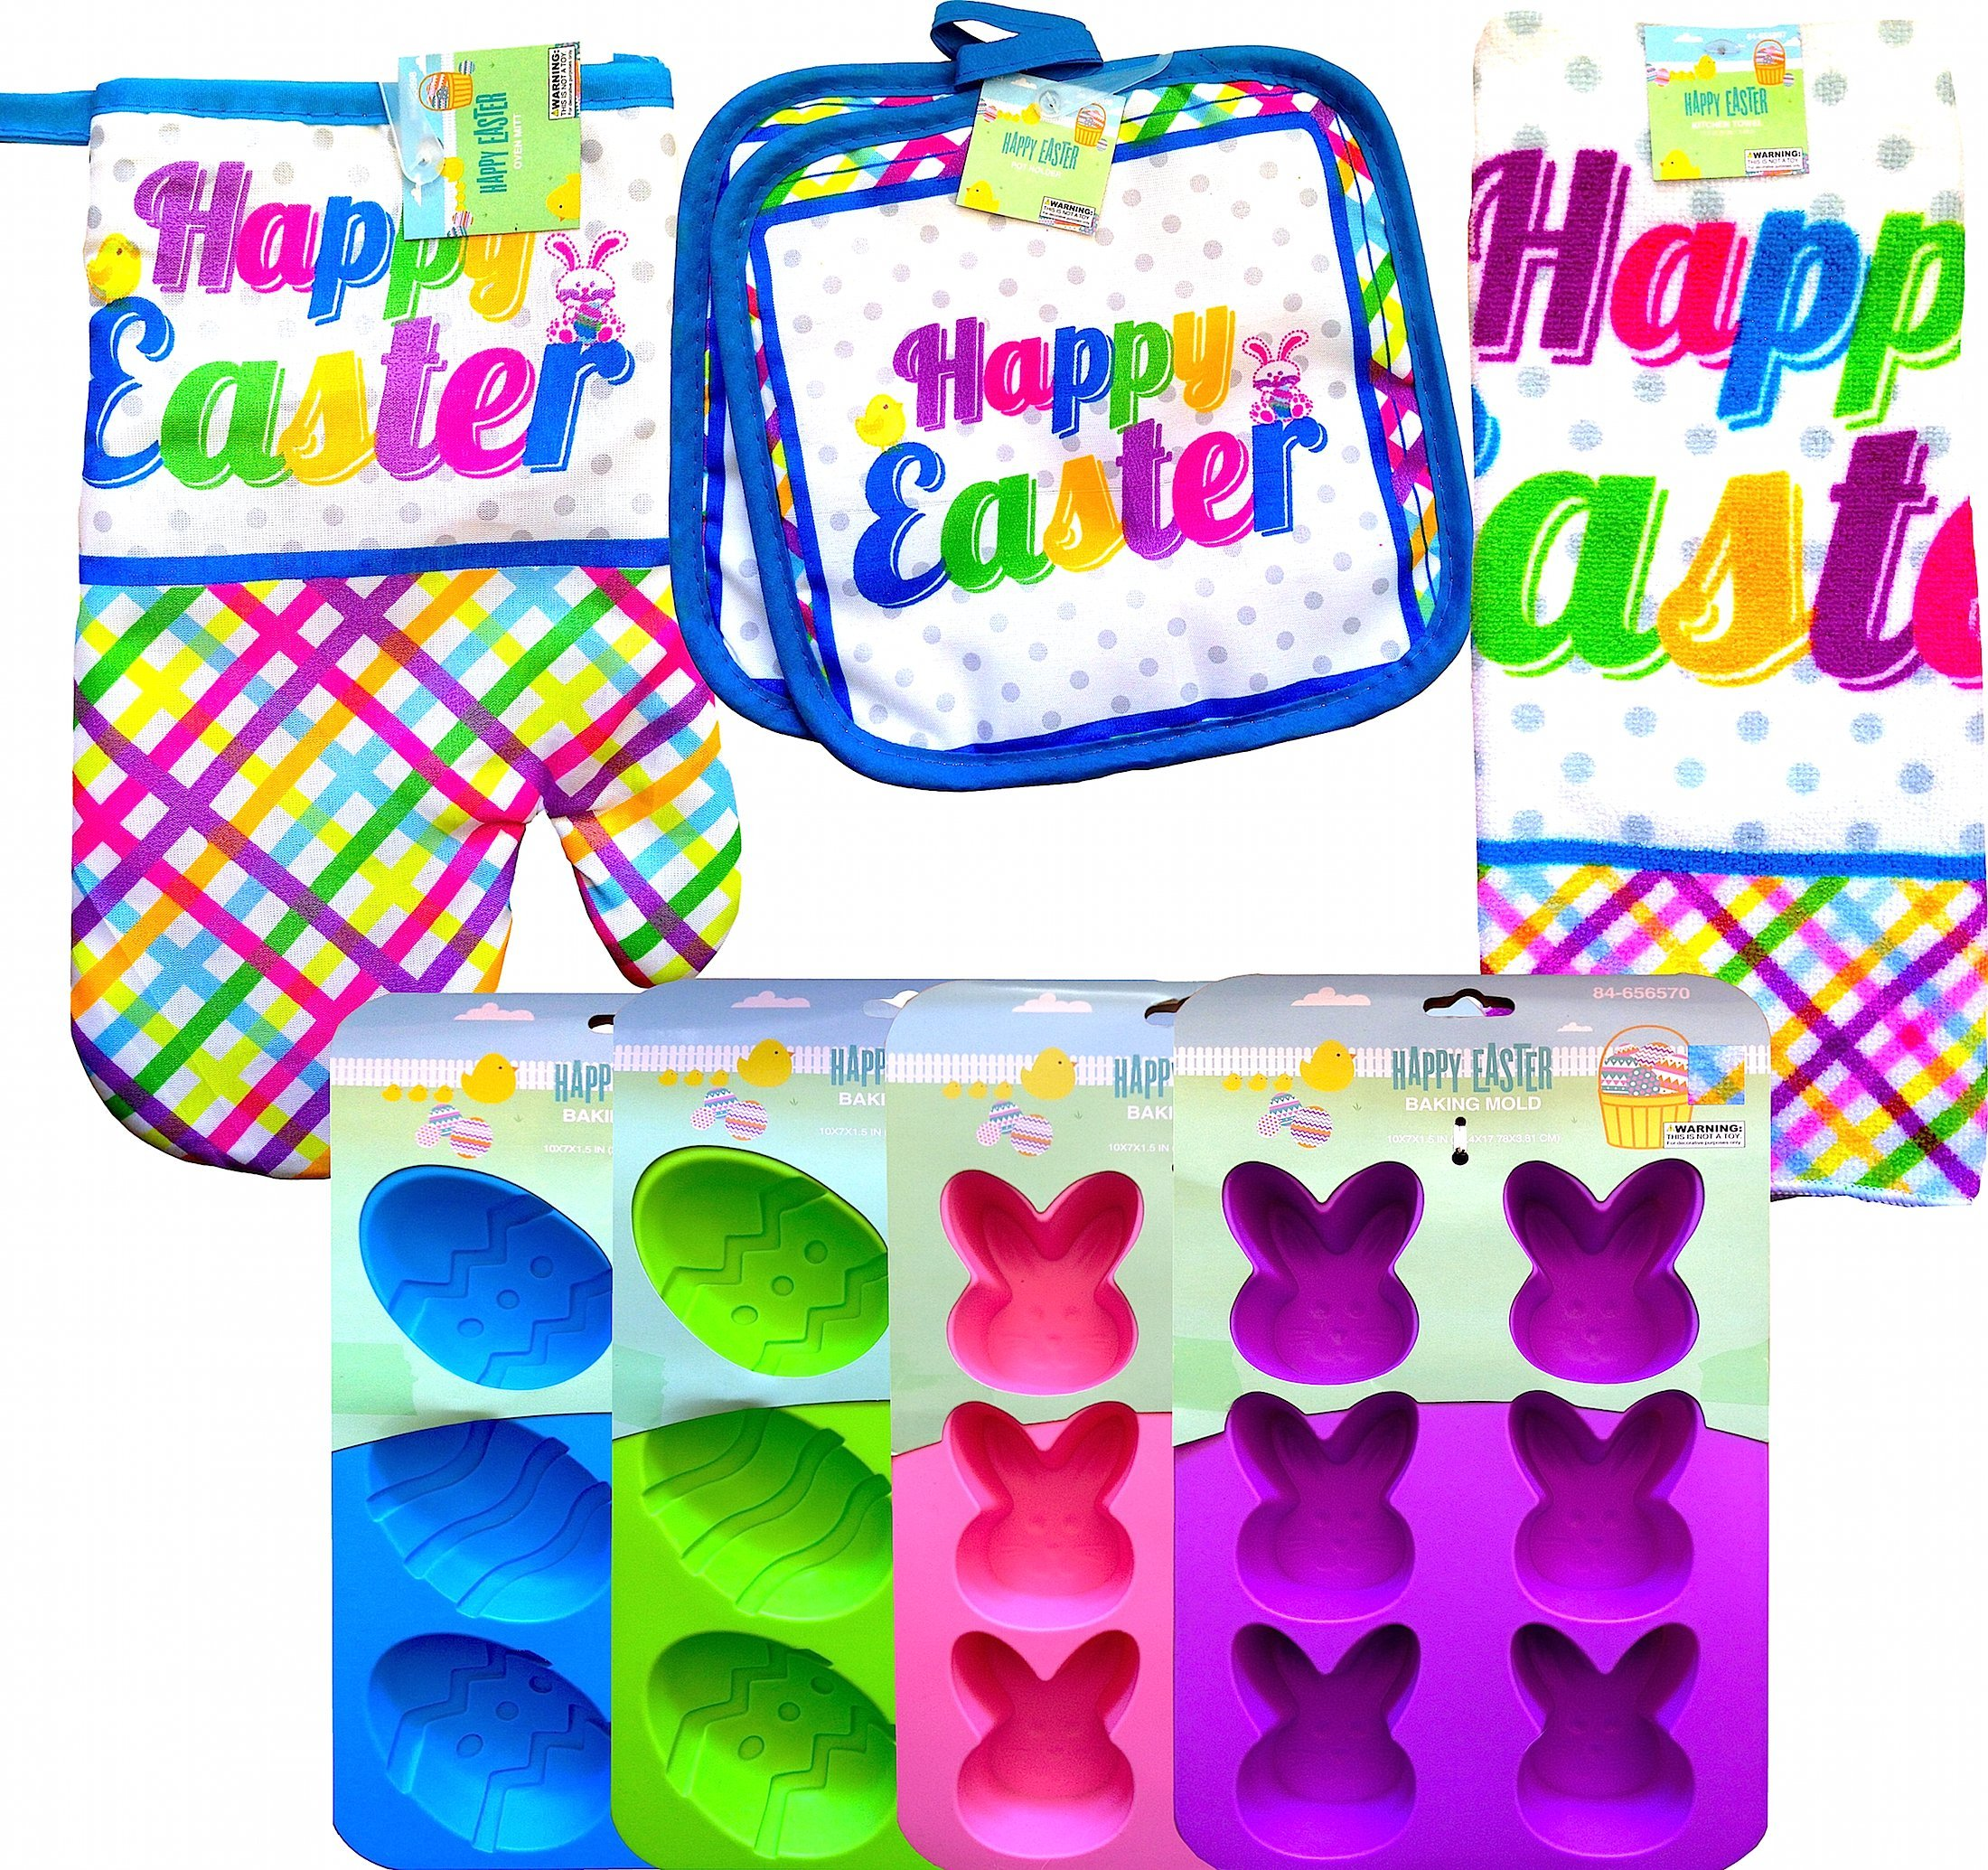 Happy Easter Kitchen Bakeware Supplies Bakeware Starter Set, Oven Mitt, Kitchen Towel,pot Holder, and Baking Mold (COMPLETE SET WITH BONUS SOLAR BUNNY)